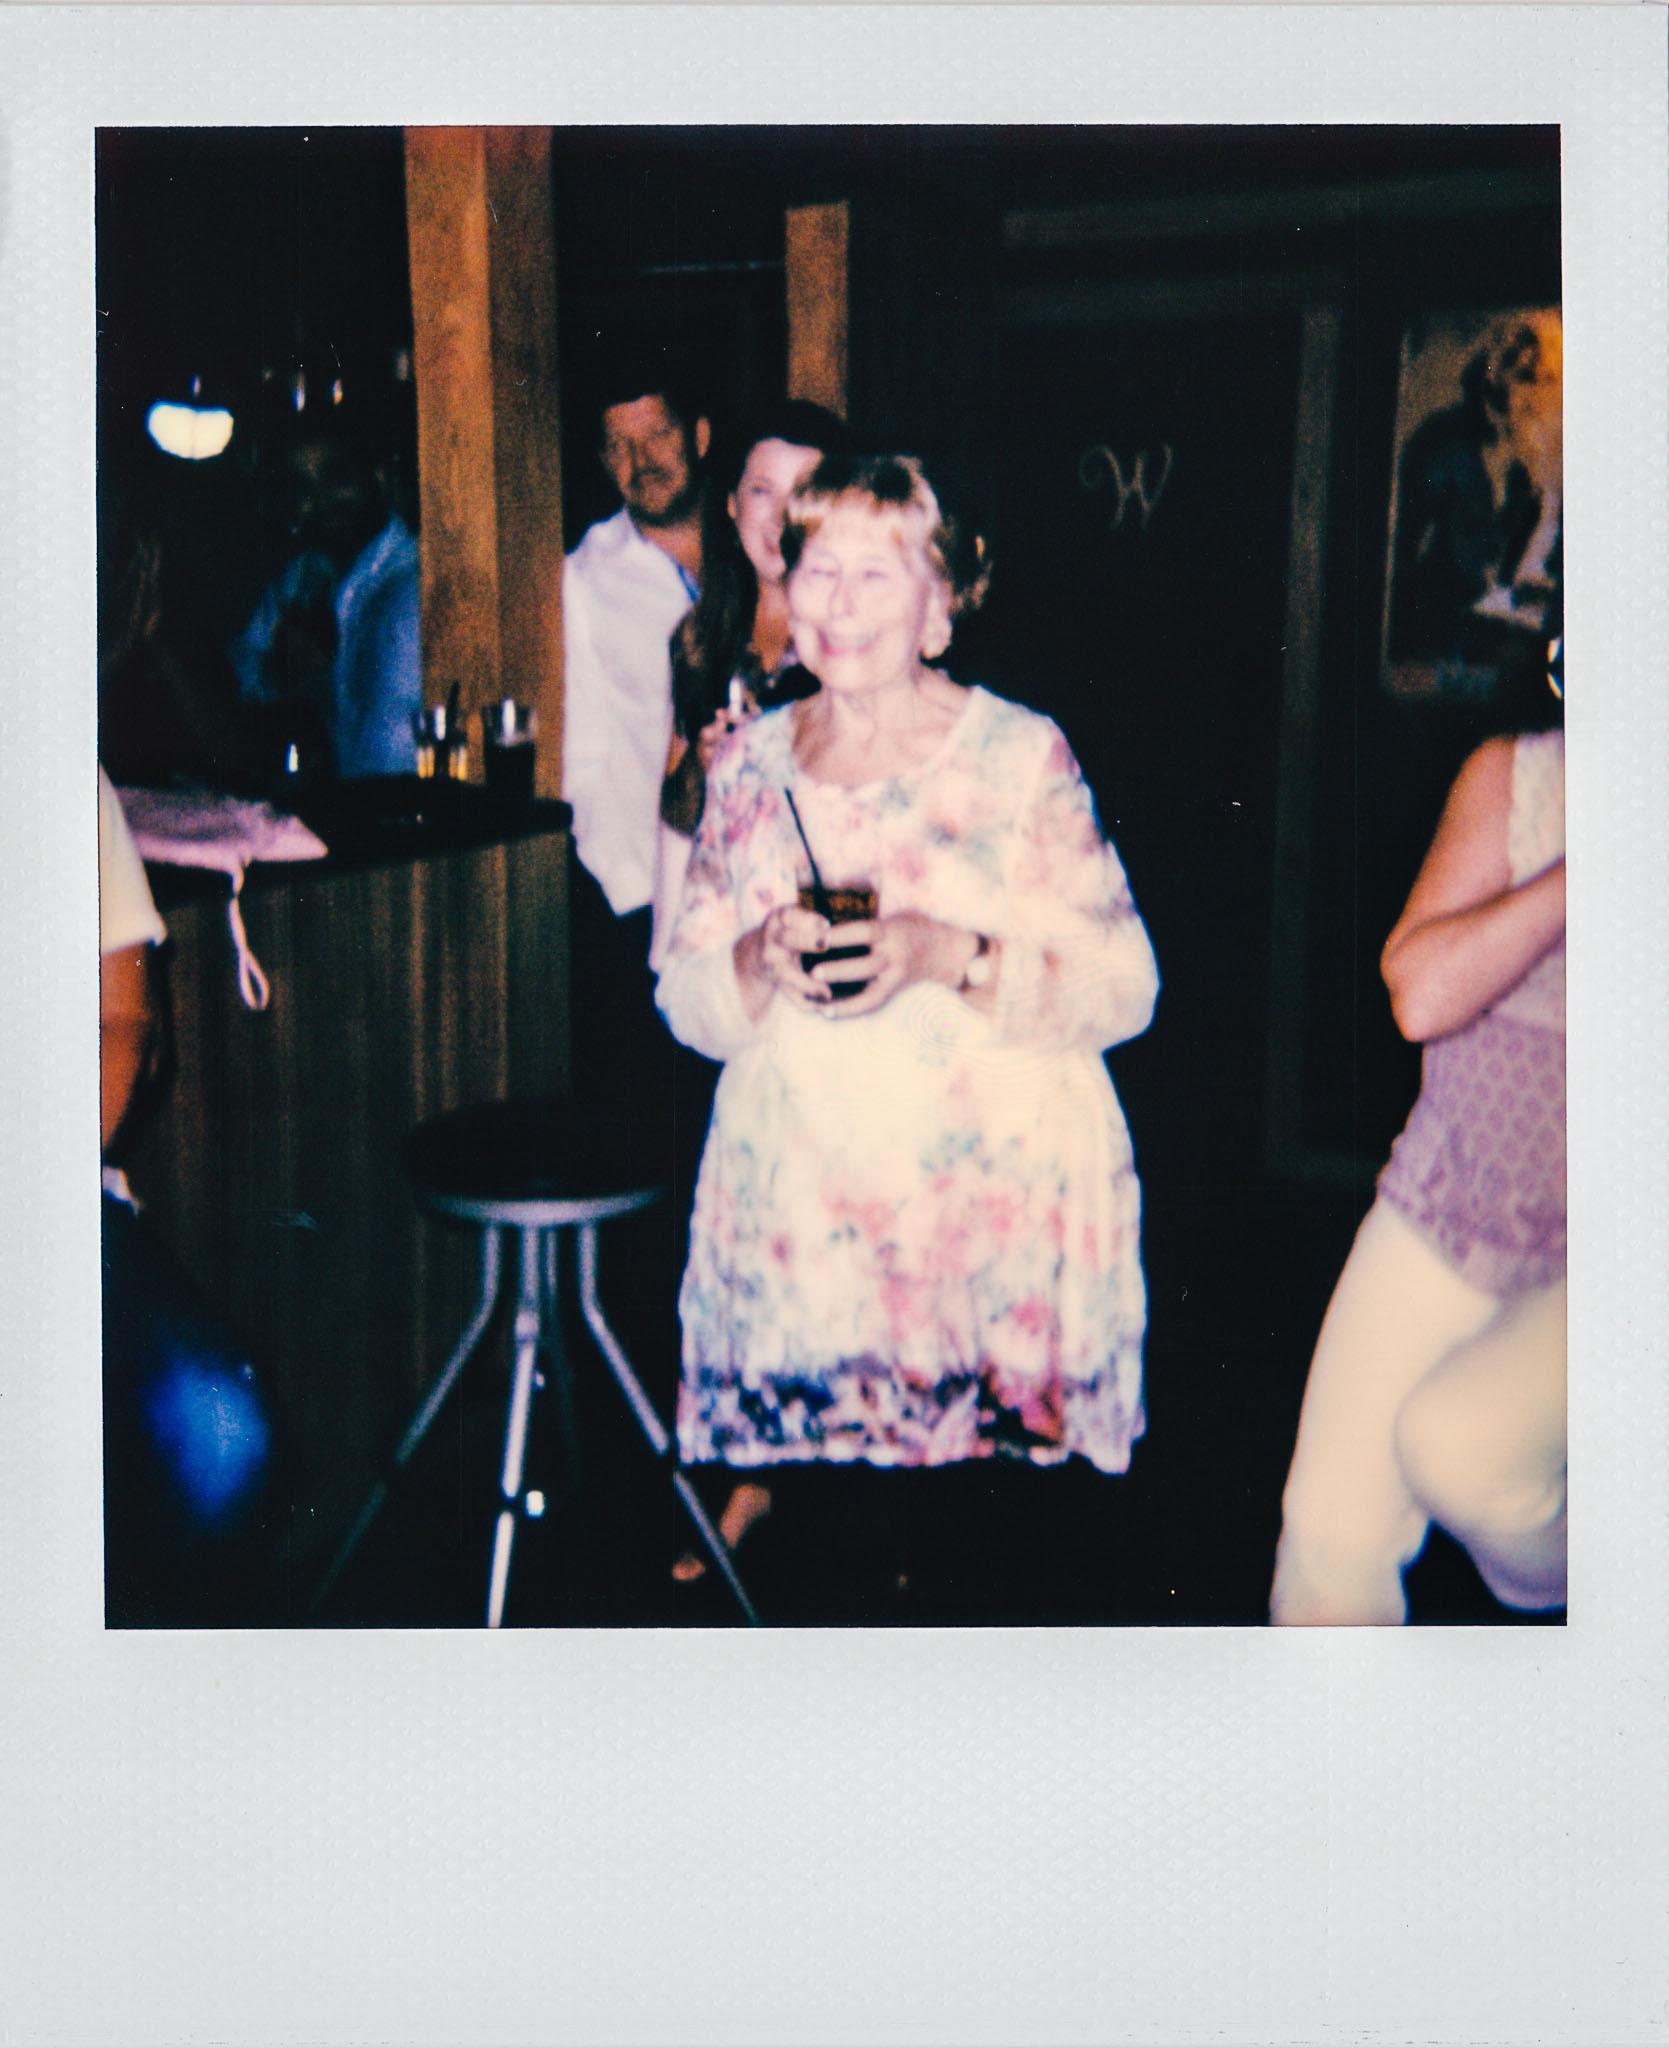 Linda Updike giving a toast at Wallys Mills Avenue Liquors